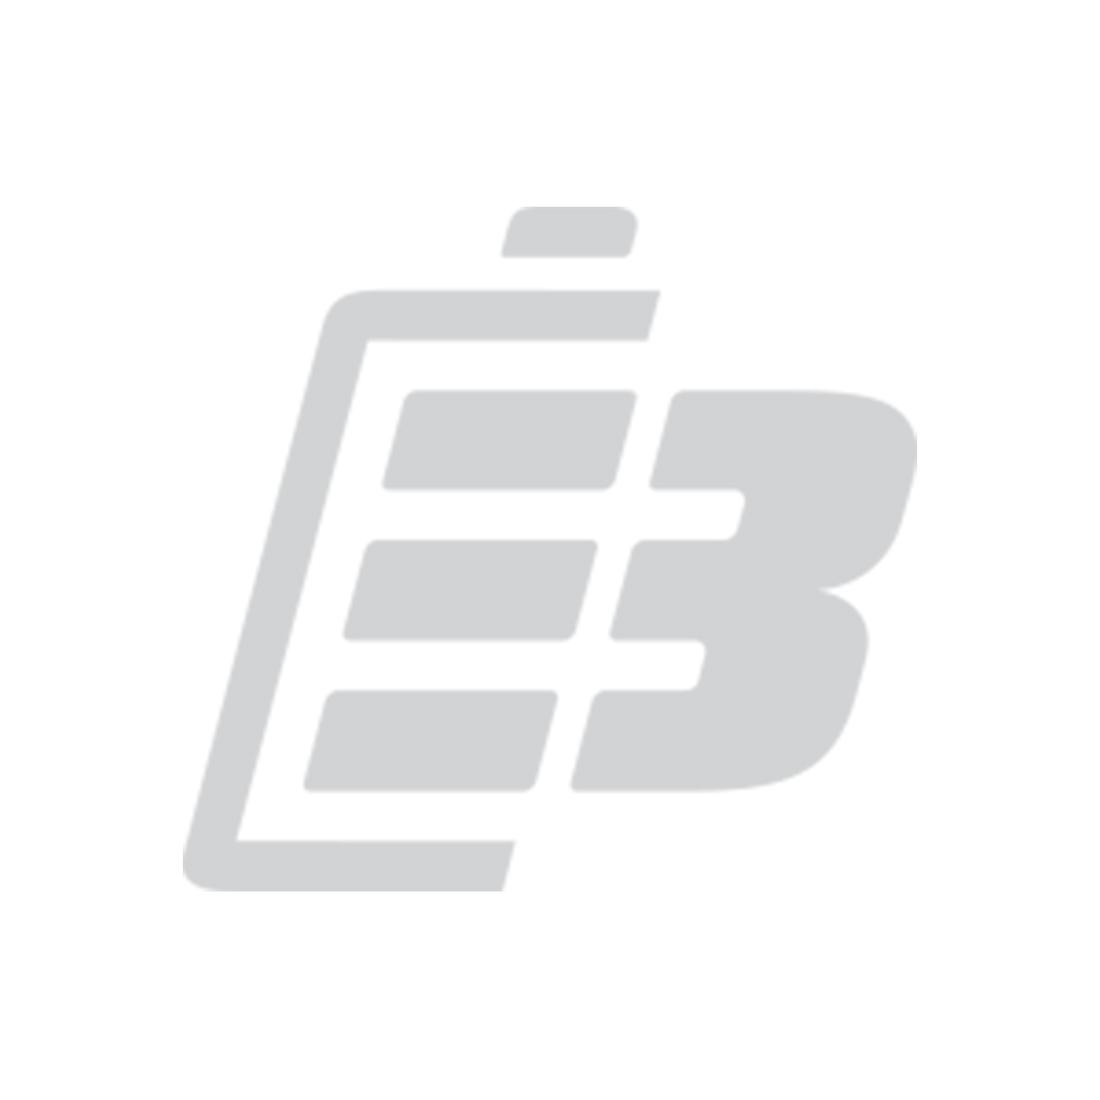 Laptop battery Asus VivoBook S200_1